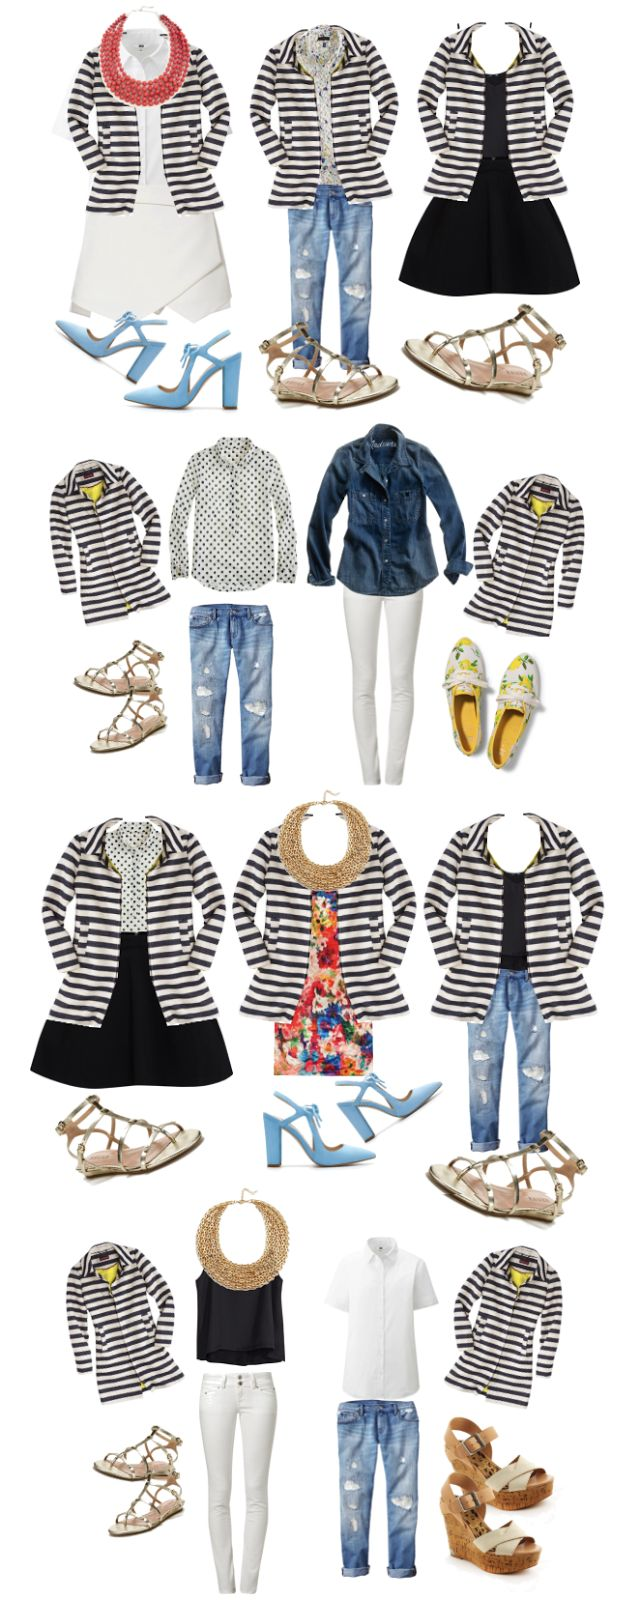 Color Me Courtney - New York City Fashion Blog